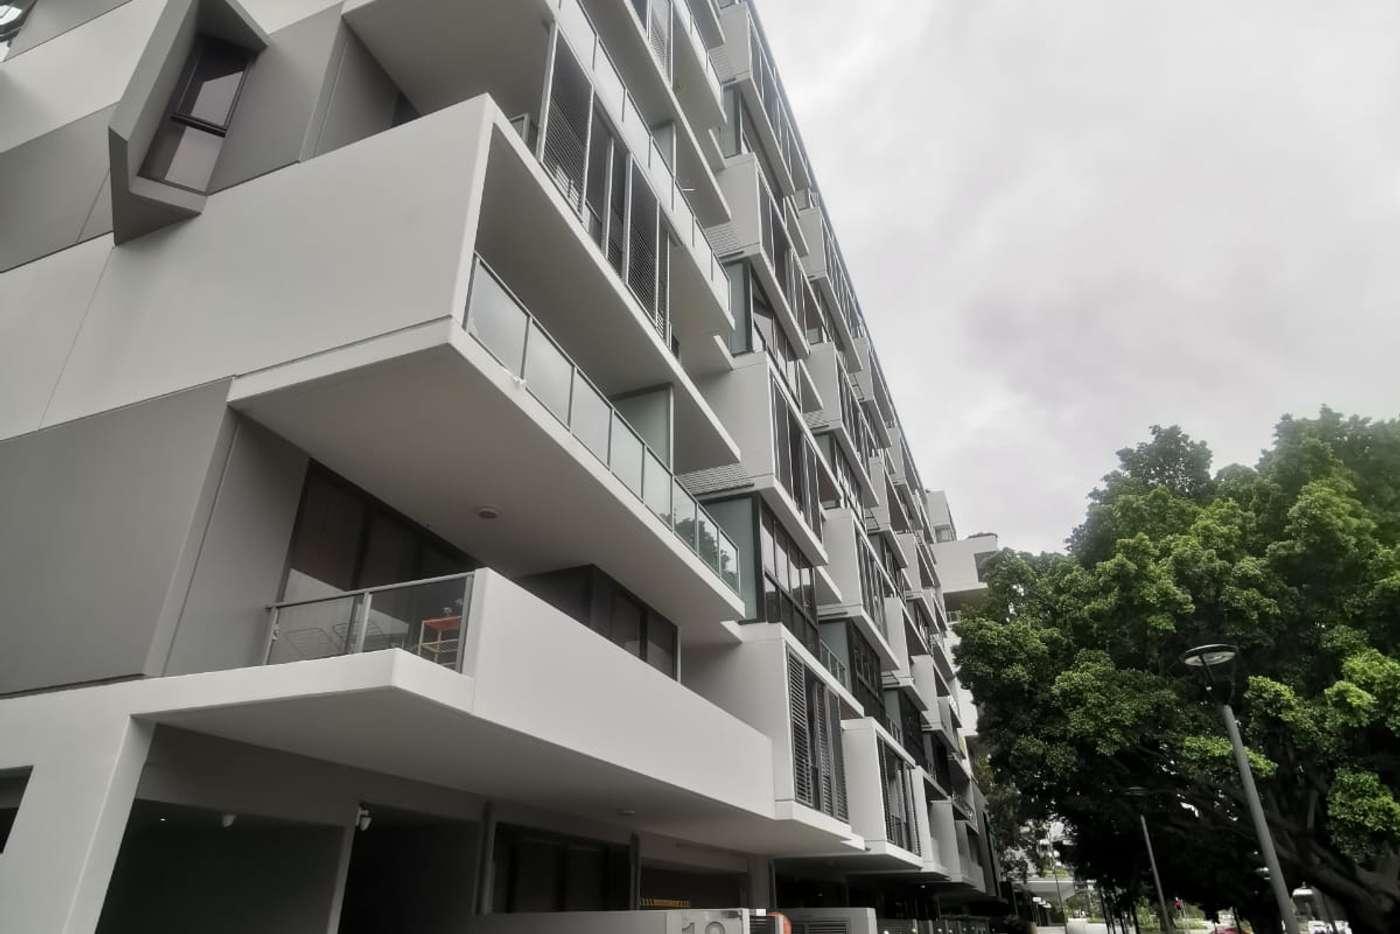 Main view of Homely unit listing, G05/19 Joynton Zvenue, Zetland NSW 2017